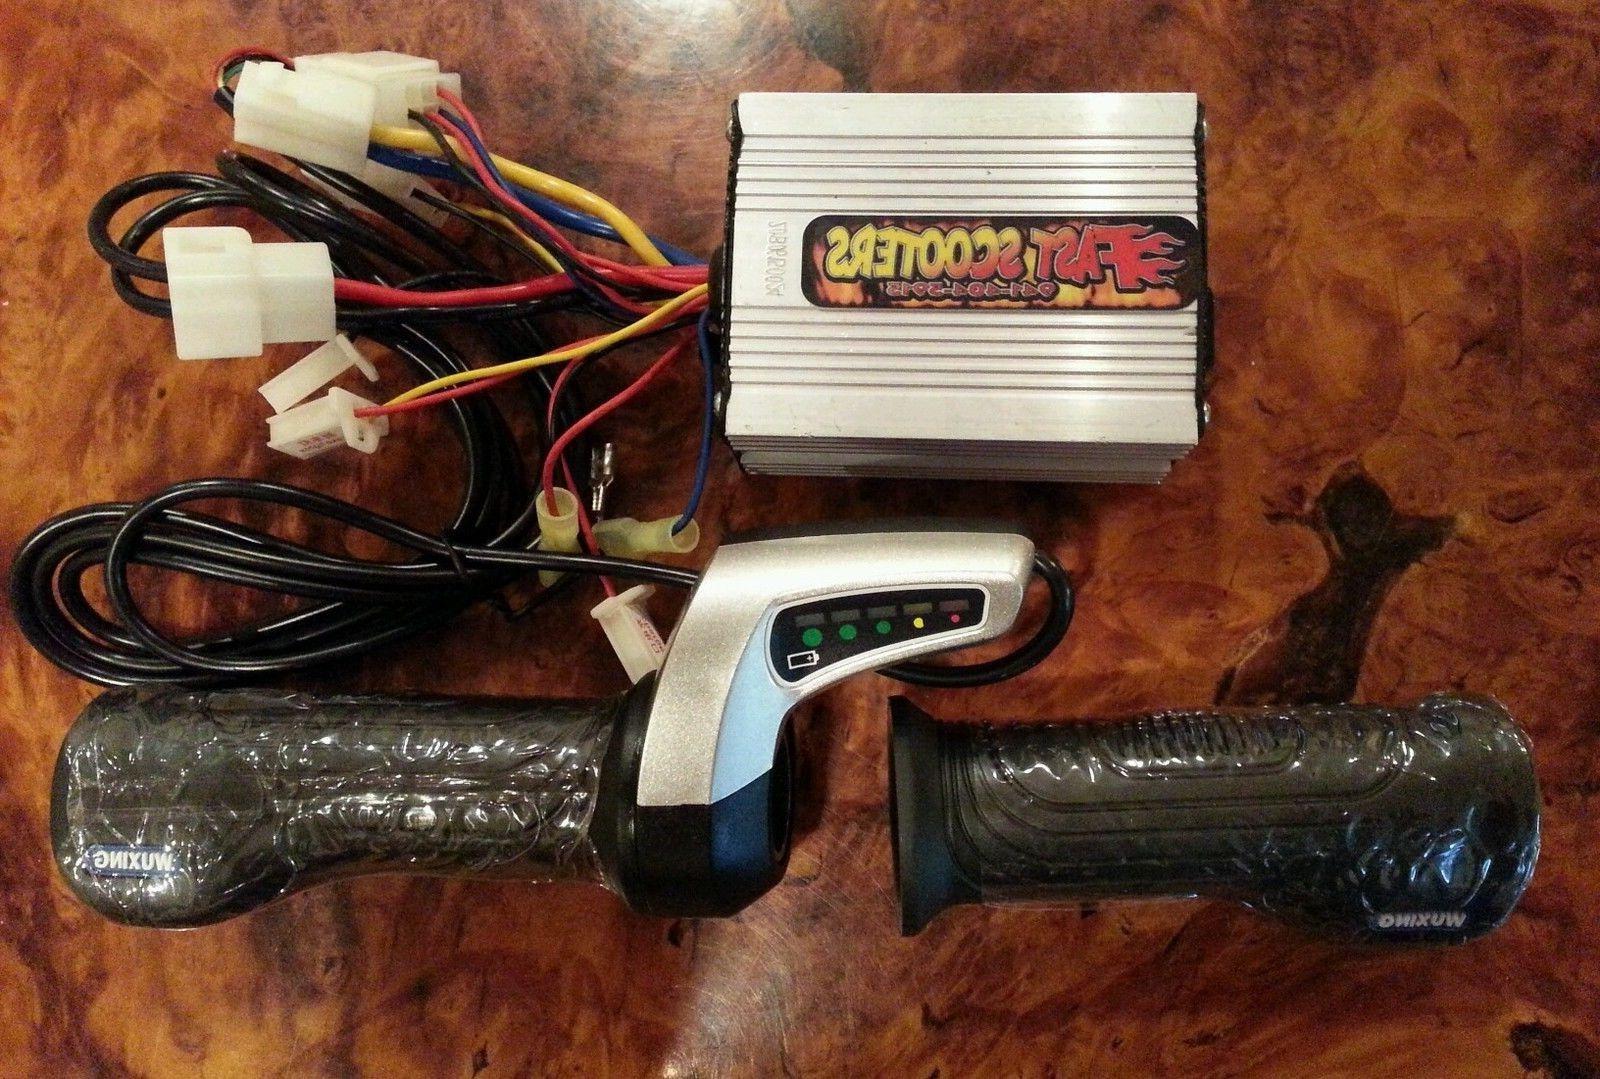 Razor upgraded throttle, controller, electrical kit- 36 Volt Kit